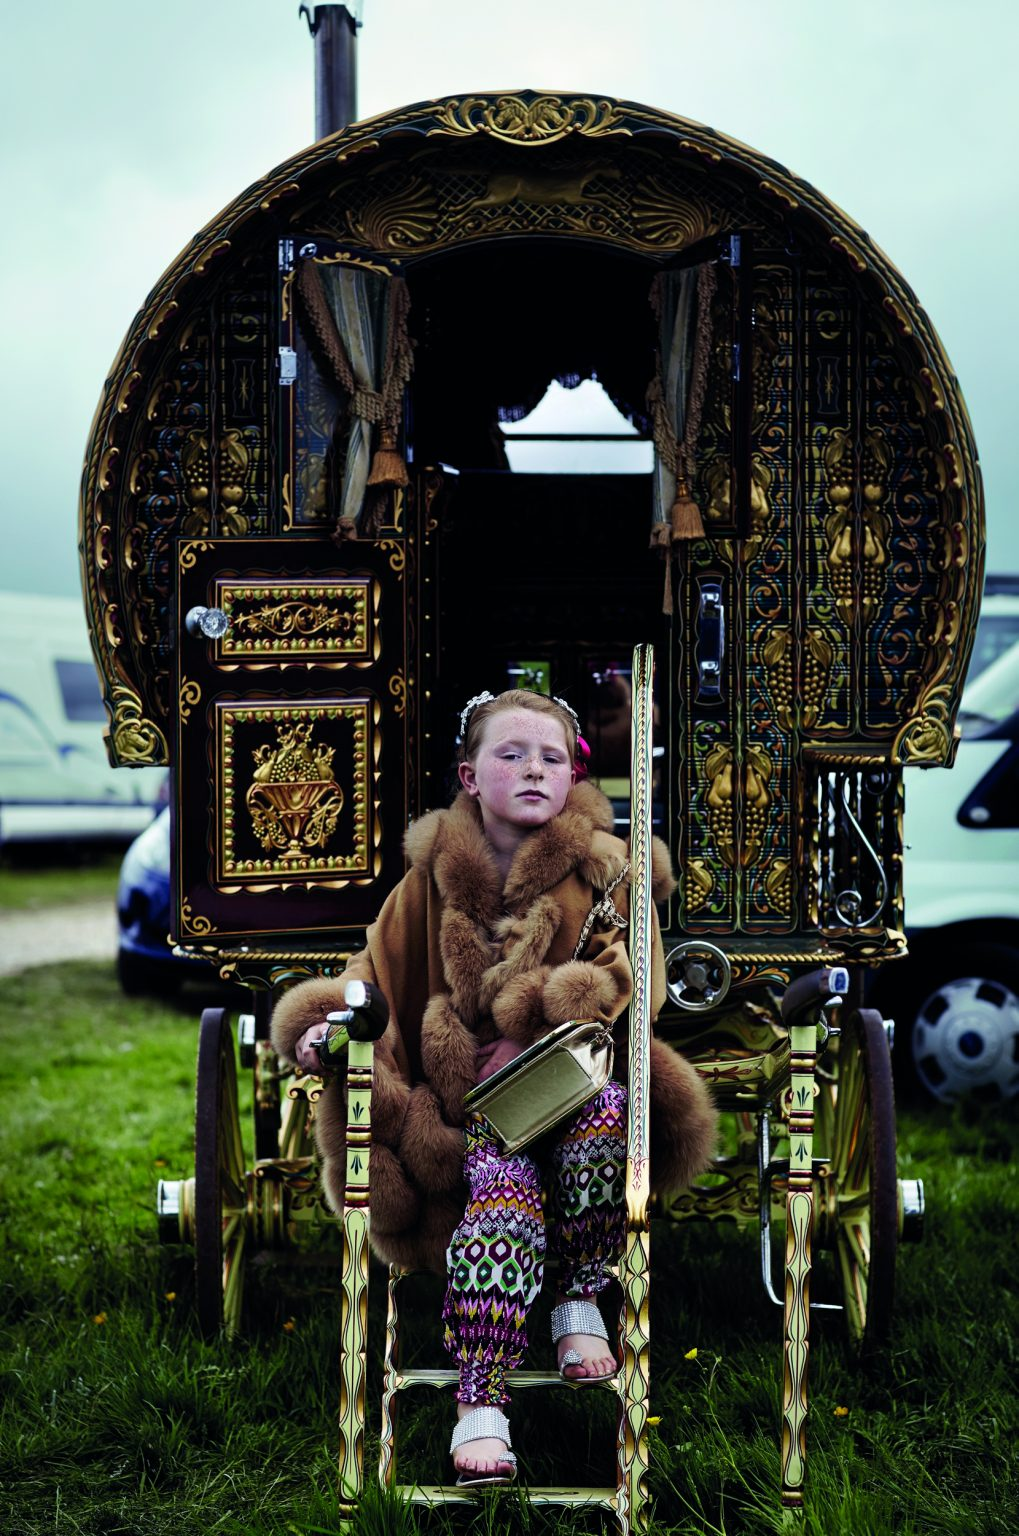 Appleby, United Kingdom, June 2015 - Appleby Horse Fair. Mary Connors sitting by an old traditional caravan. ><  Appleby, Regno Unito, giugno 2015 - Appleby Horse Fair. Mary Connors seduta sulla scaletta di una carrozza tradizionale. *** Local Caption ***